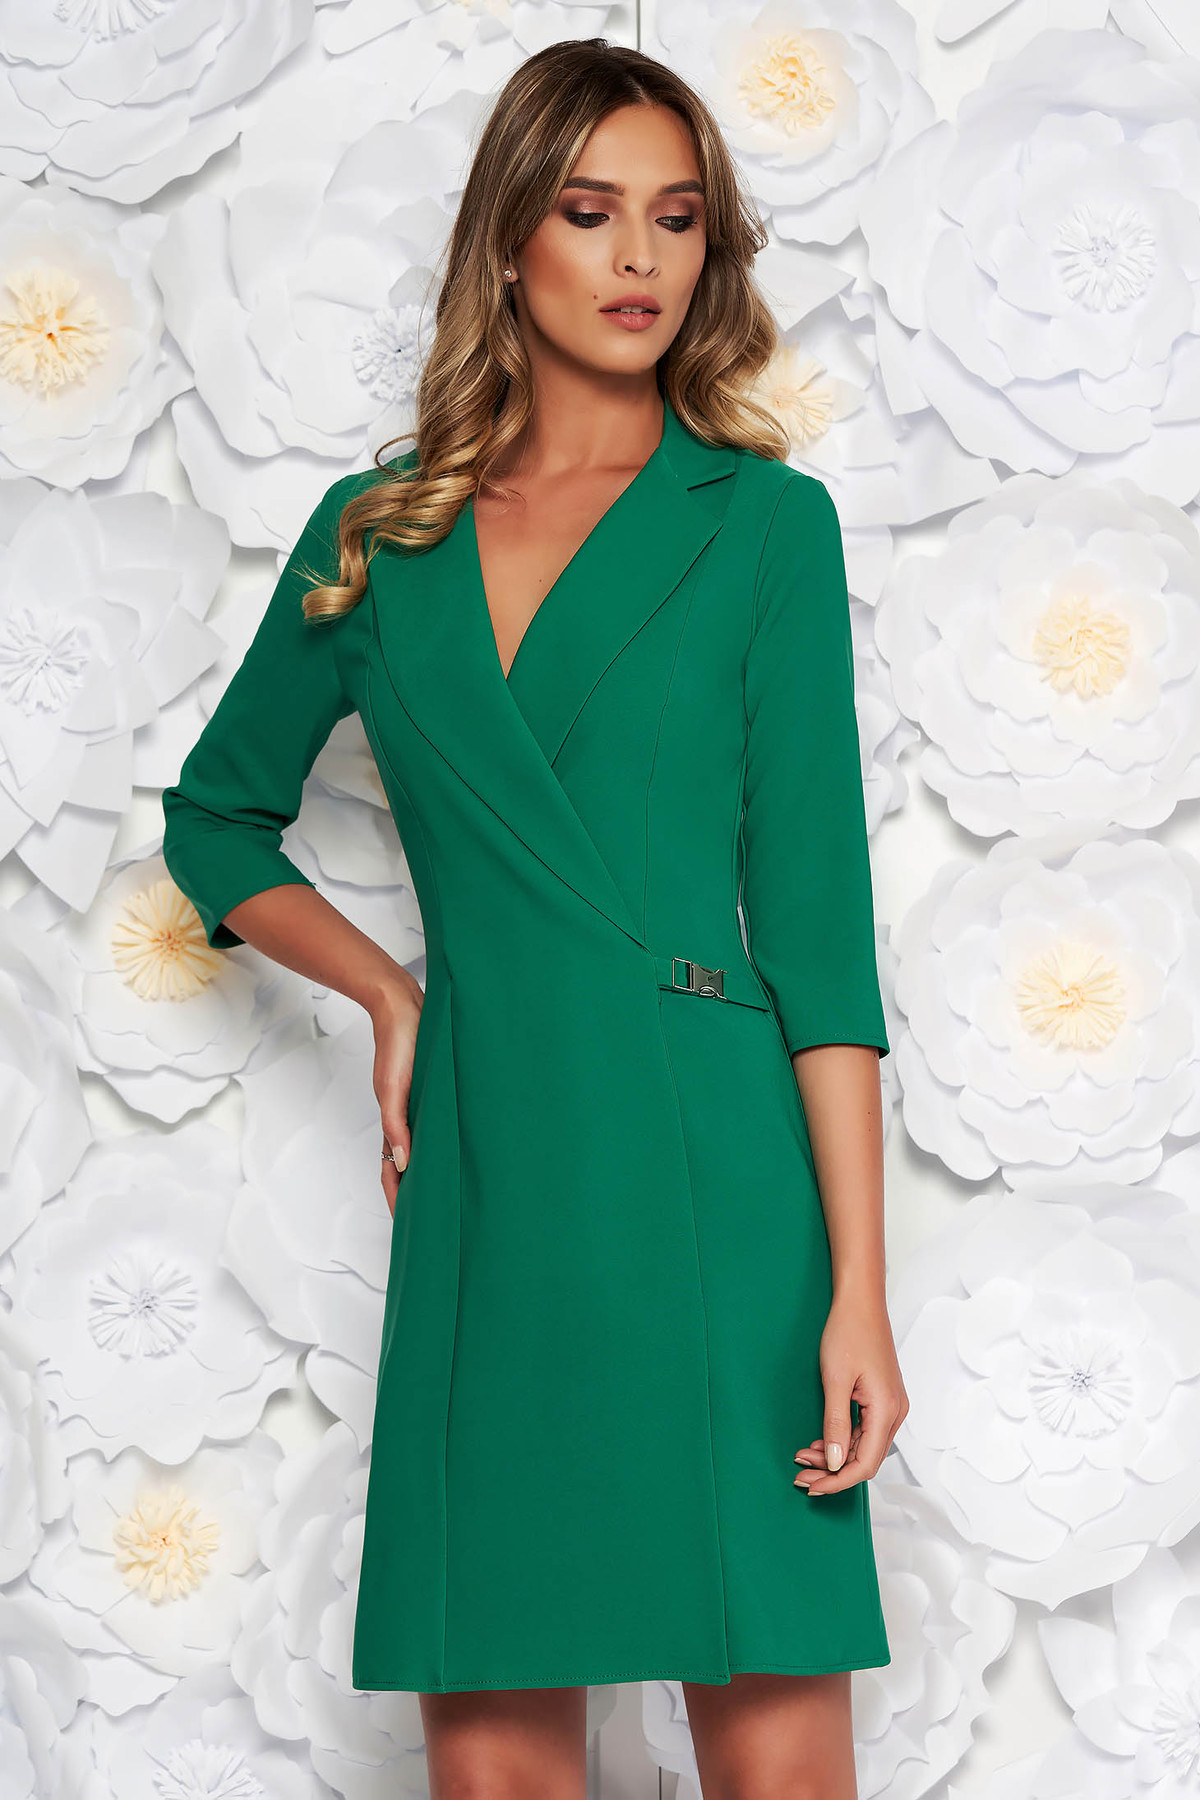 Rochie Artista verde eleganta tip sacou cu croi in A din stofa usor elastica captusita pe interior